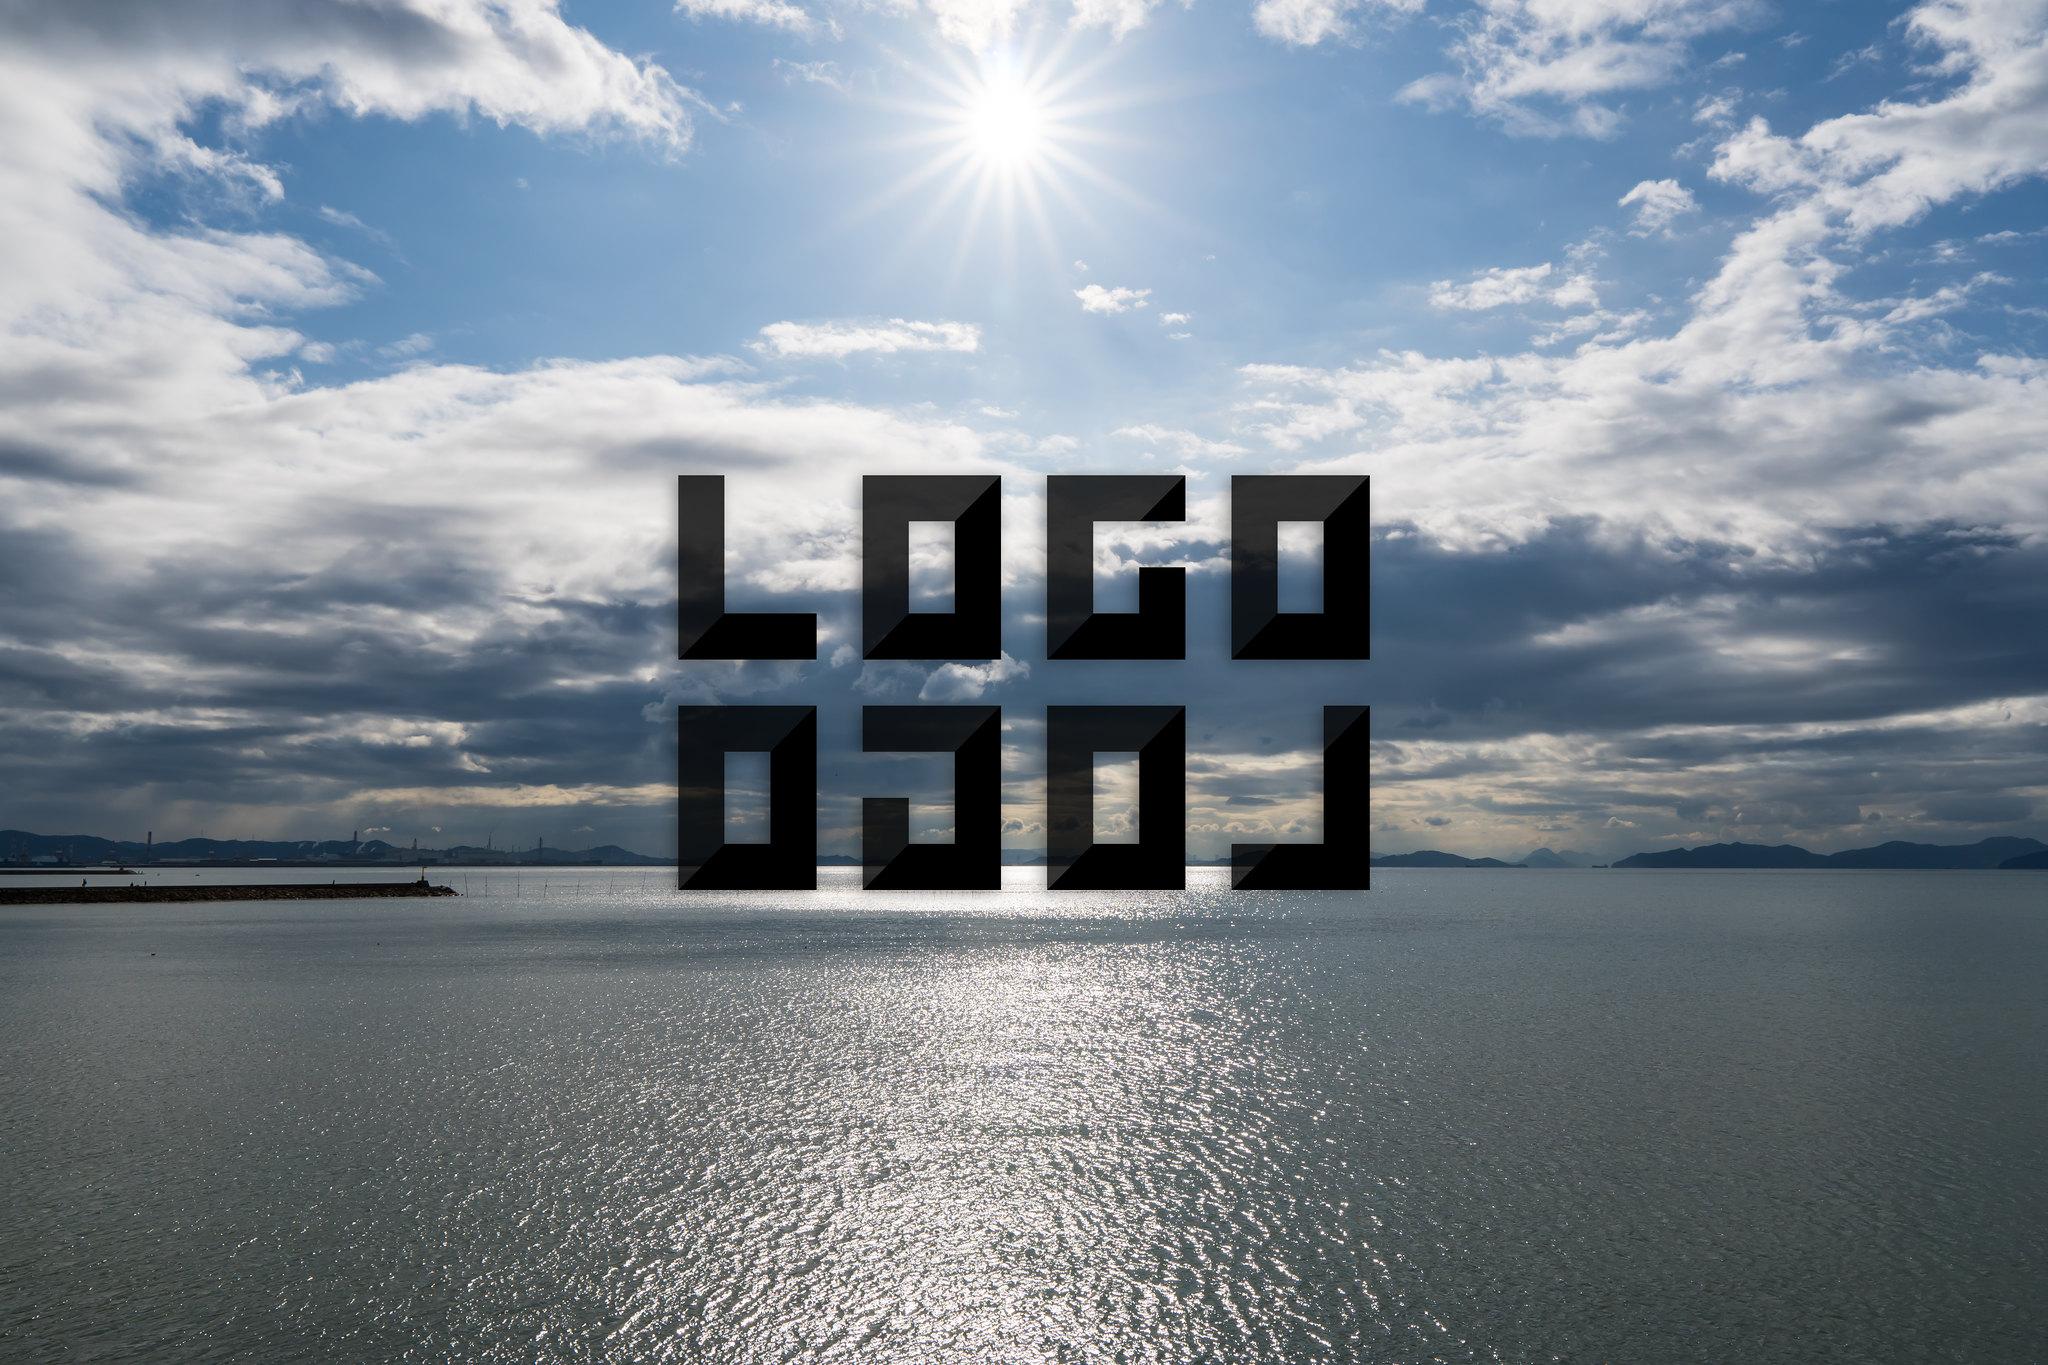 LOGLOGO「ロゴロゴ」用ビジュアル 岡山県倉敷市黒崎(沙美)からの瀬戸内海の眺め